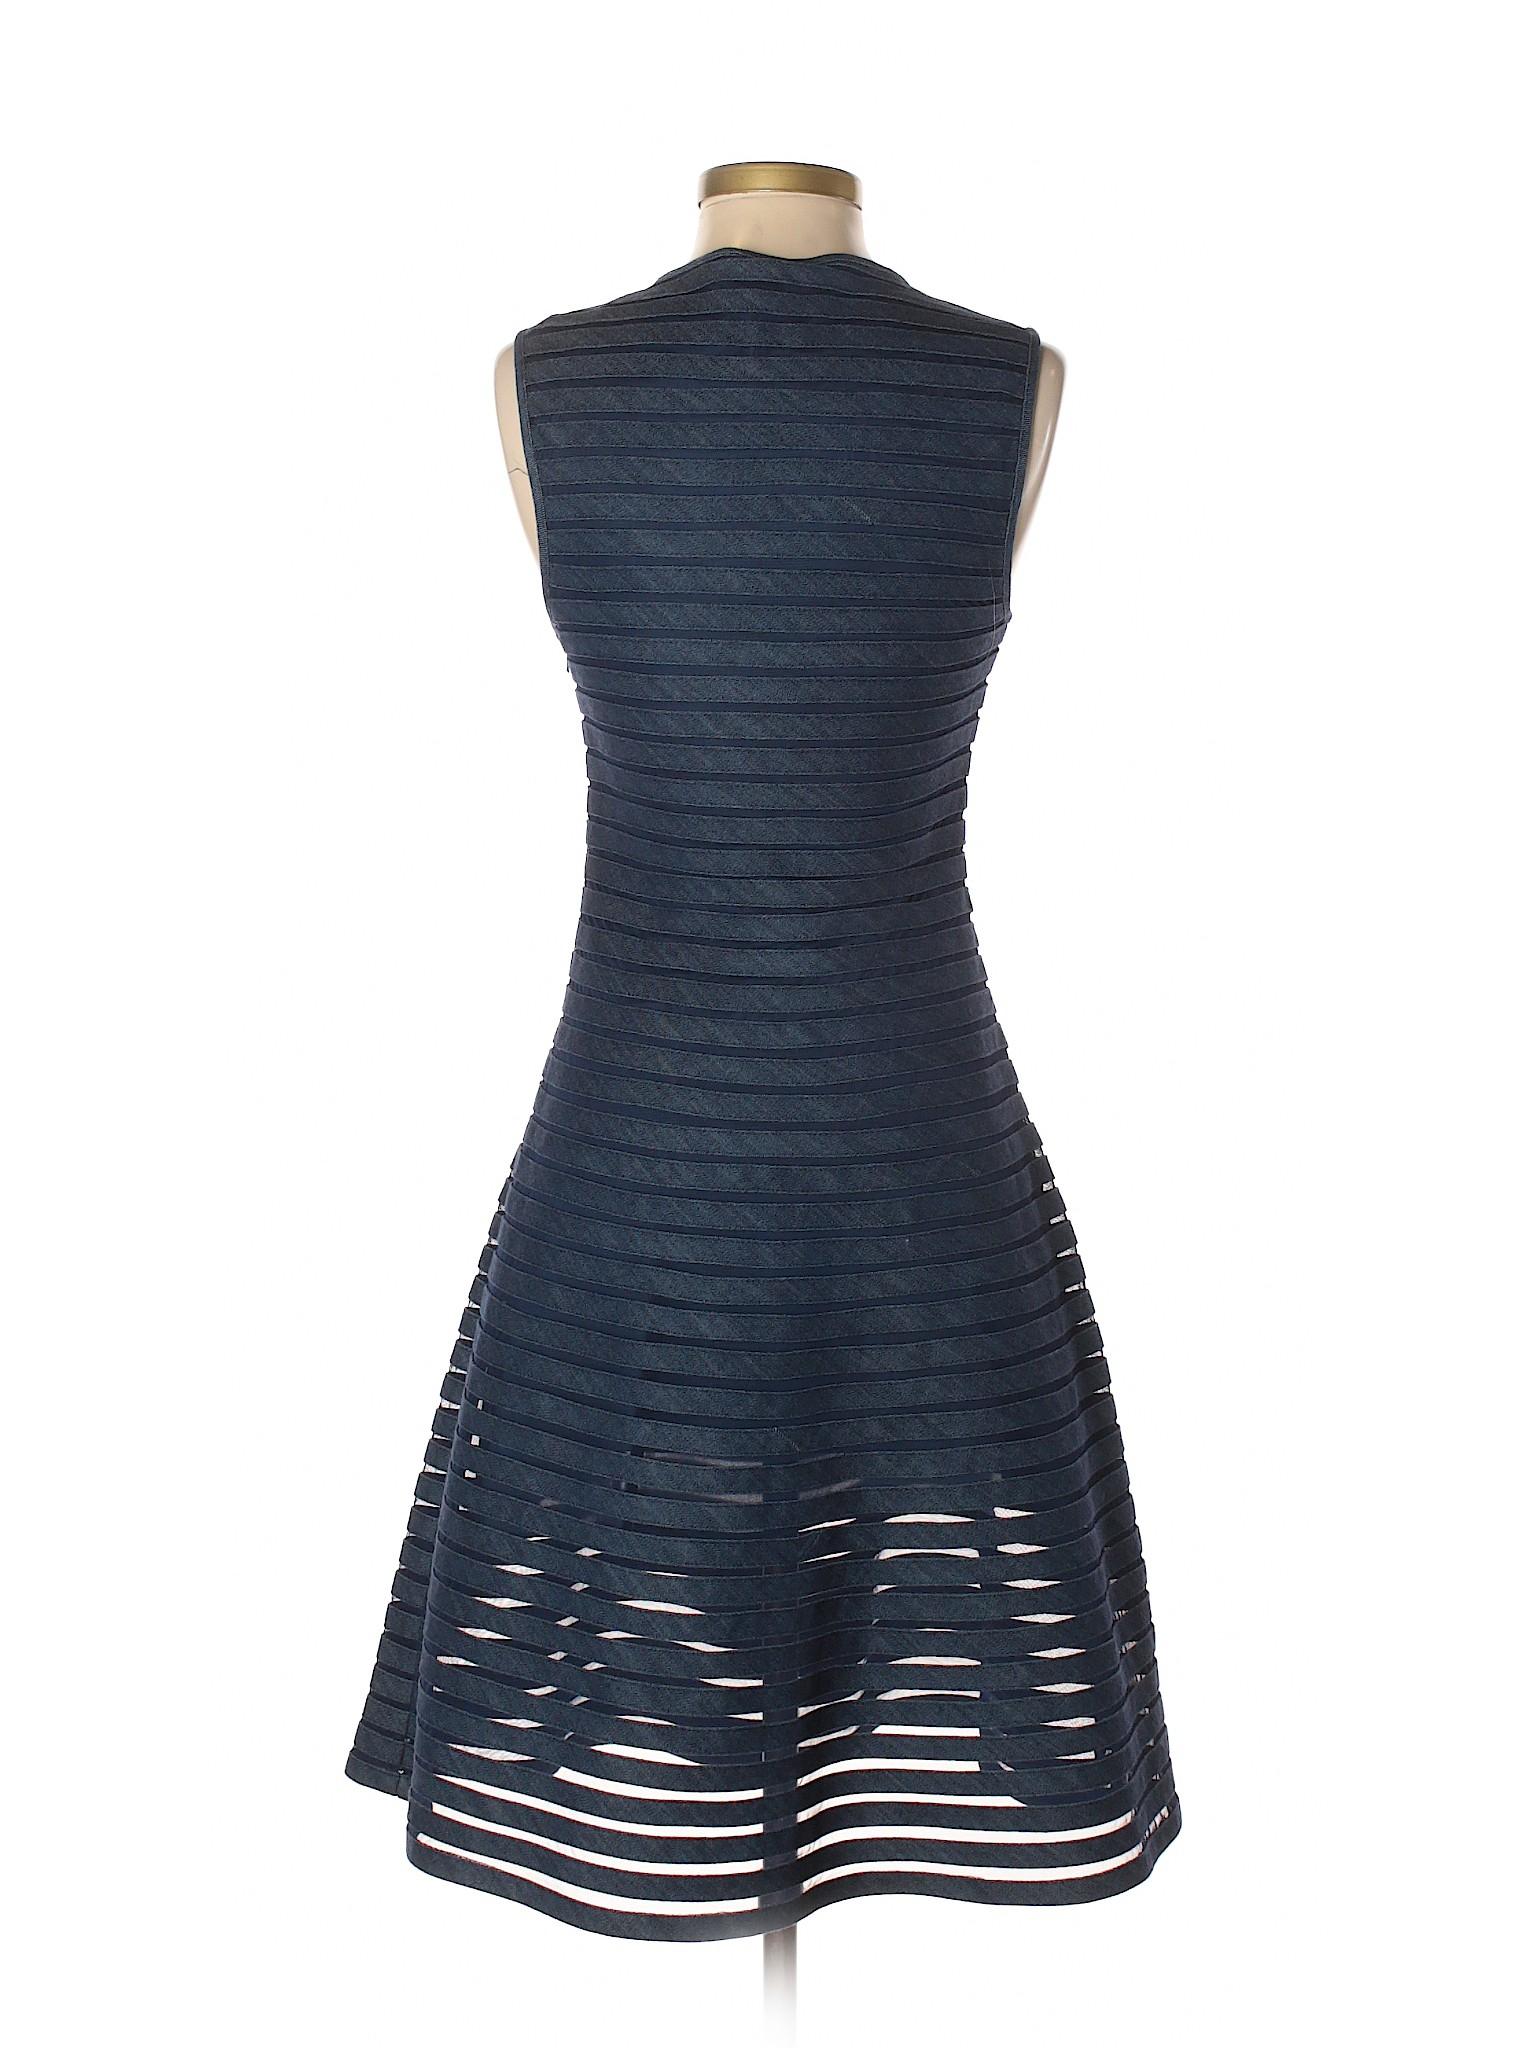 Casual Cynthia Selling Dress Marshalls for Rowley 8w01qU